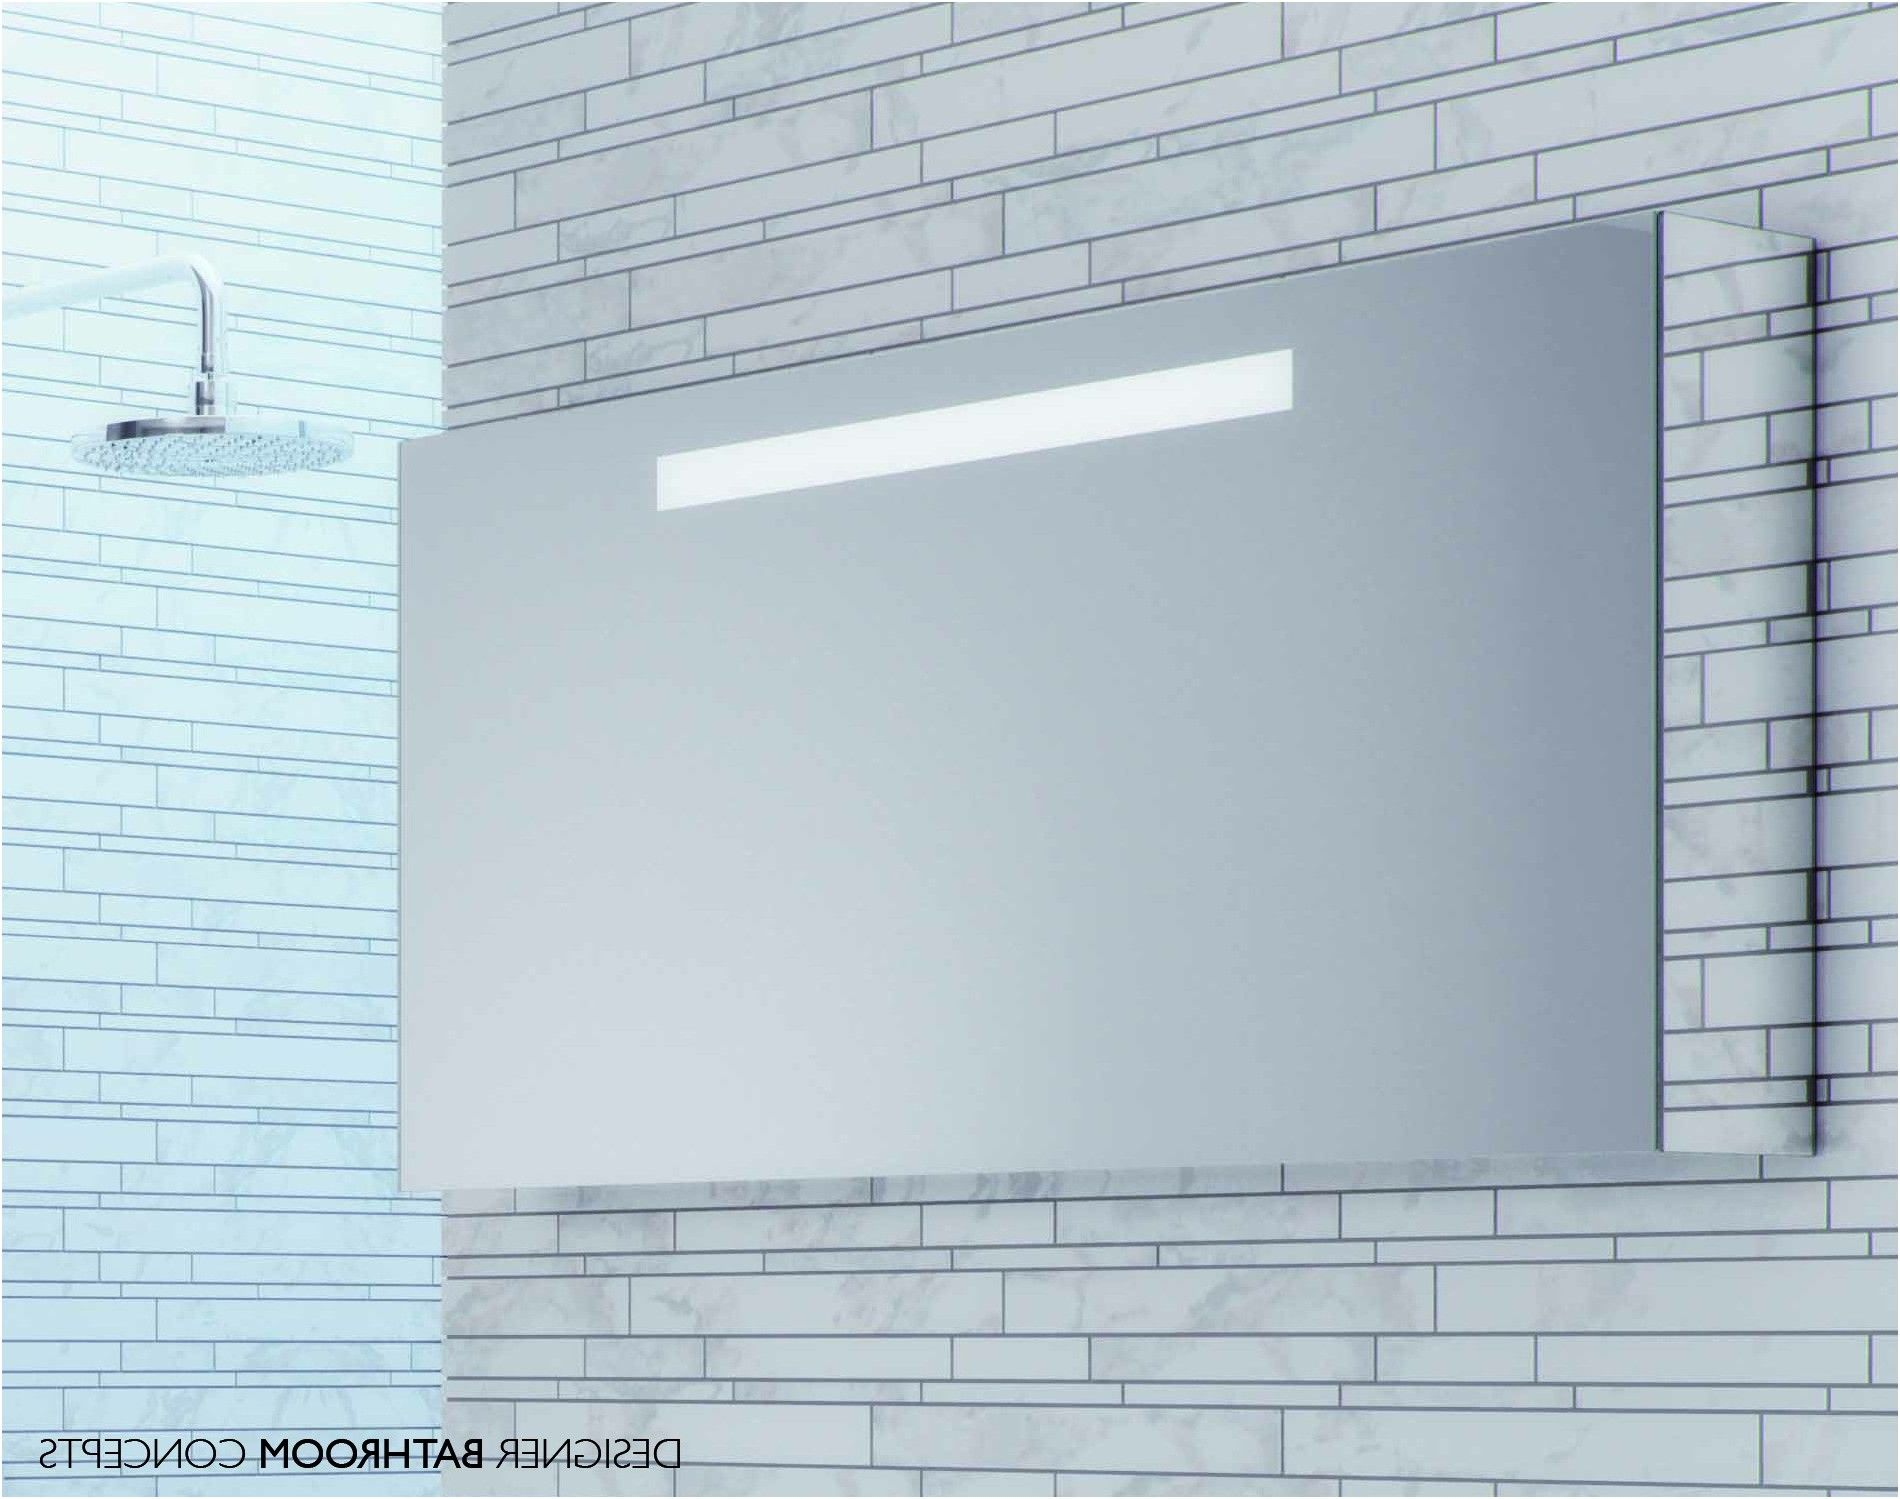 java designer illuminated mirrored bathroom cabinet mwl60 1fl from Illuminated Mirror Bathroom Cabinet & java designer illuminated mirrored bathroom cabinet mwl60 1fl from ...